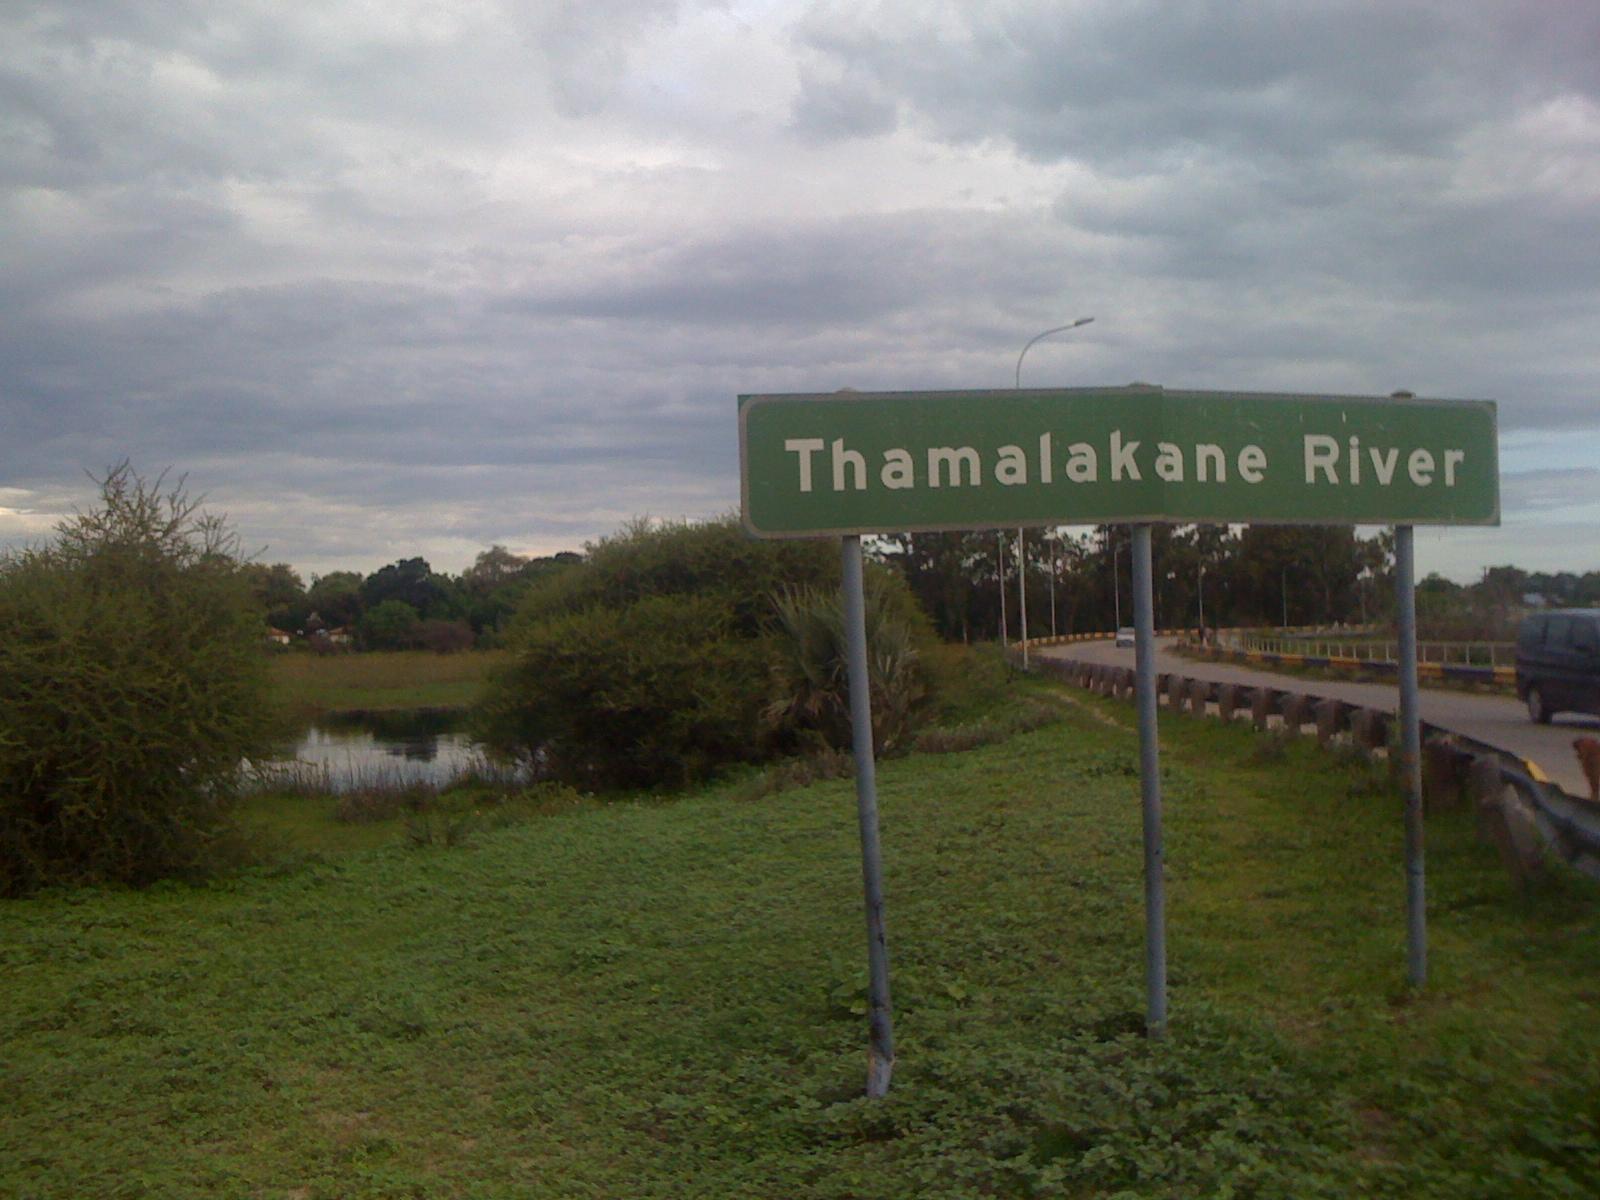 Thamalakane River in Maun